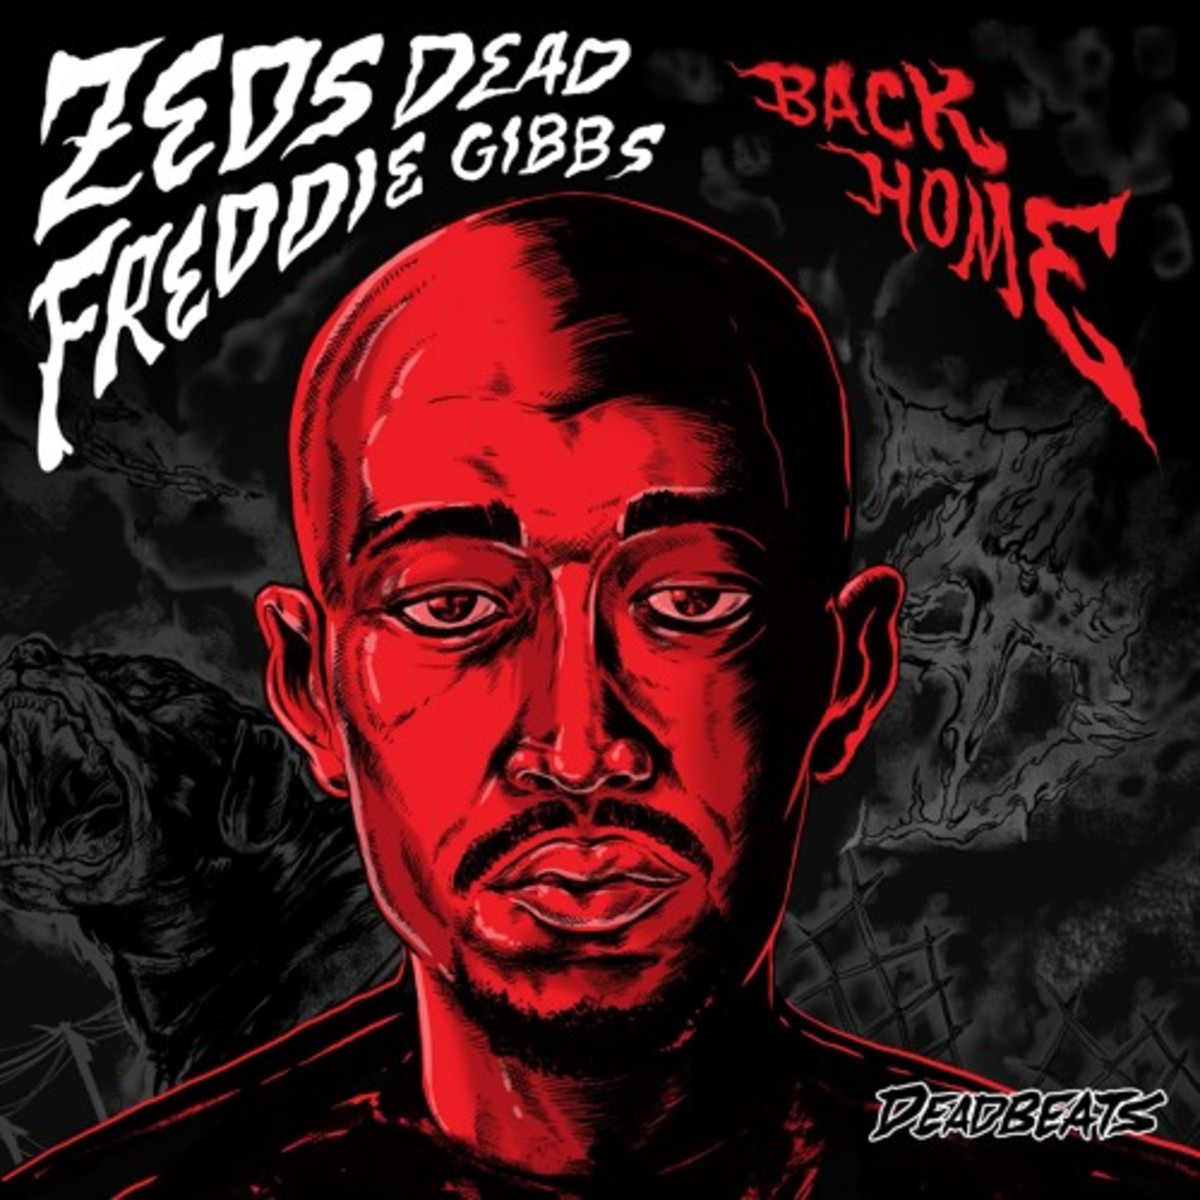 zeds-dead-back-home.jpg